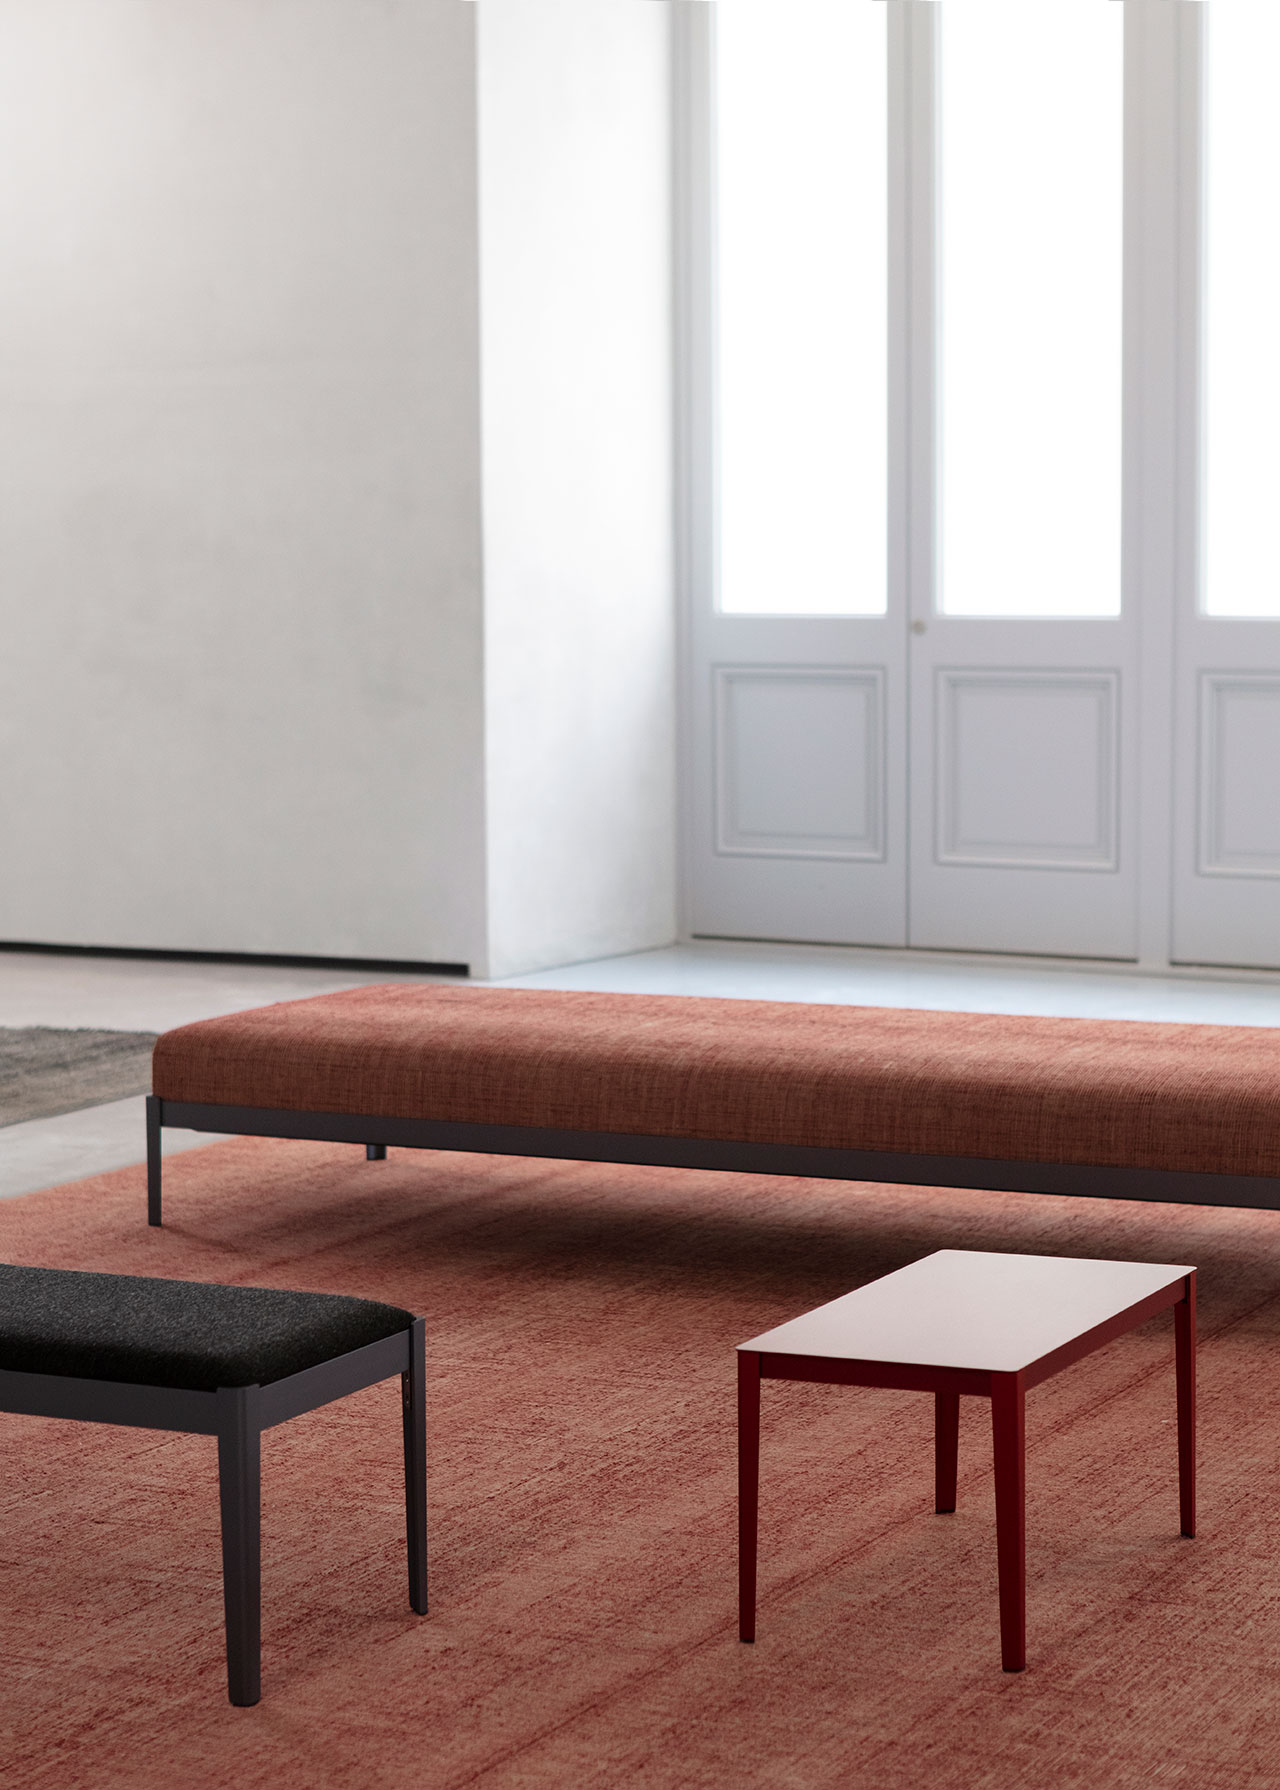 Ronan et Erwan Bouroullec, Interior furnishings for the Salon, carpets and benches, 2020. © Studio Bouroullec. © Tadao Ando Architect & Associates, NeM / Niney et MarcaCourtesy Bourse de Commerce - Pinault Collection